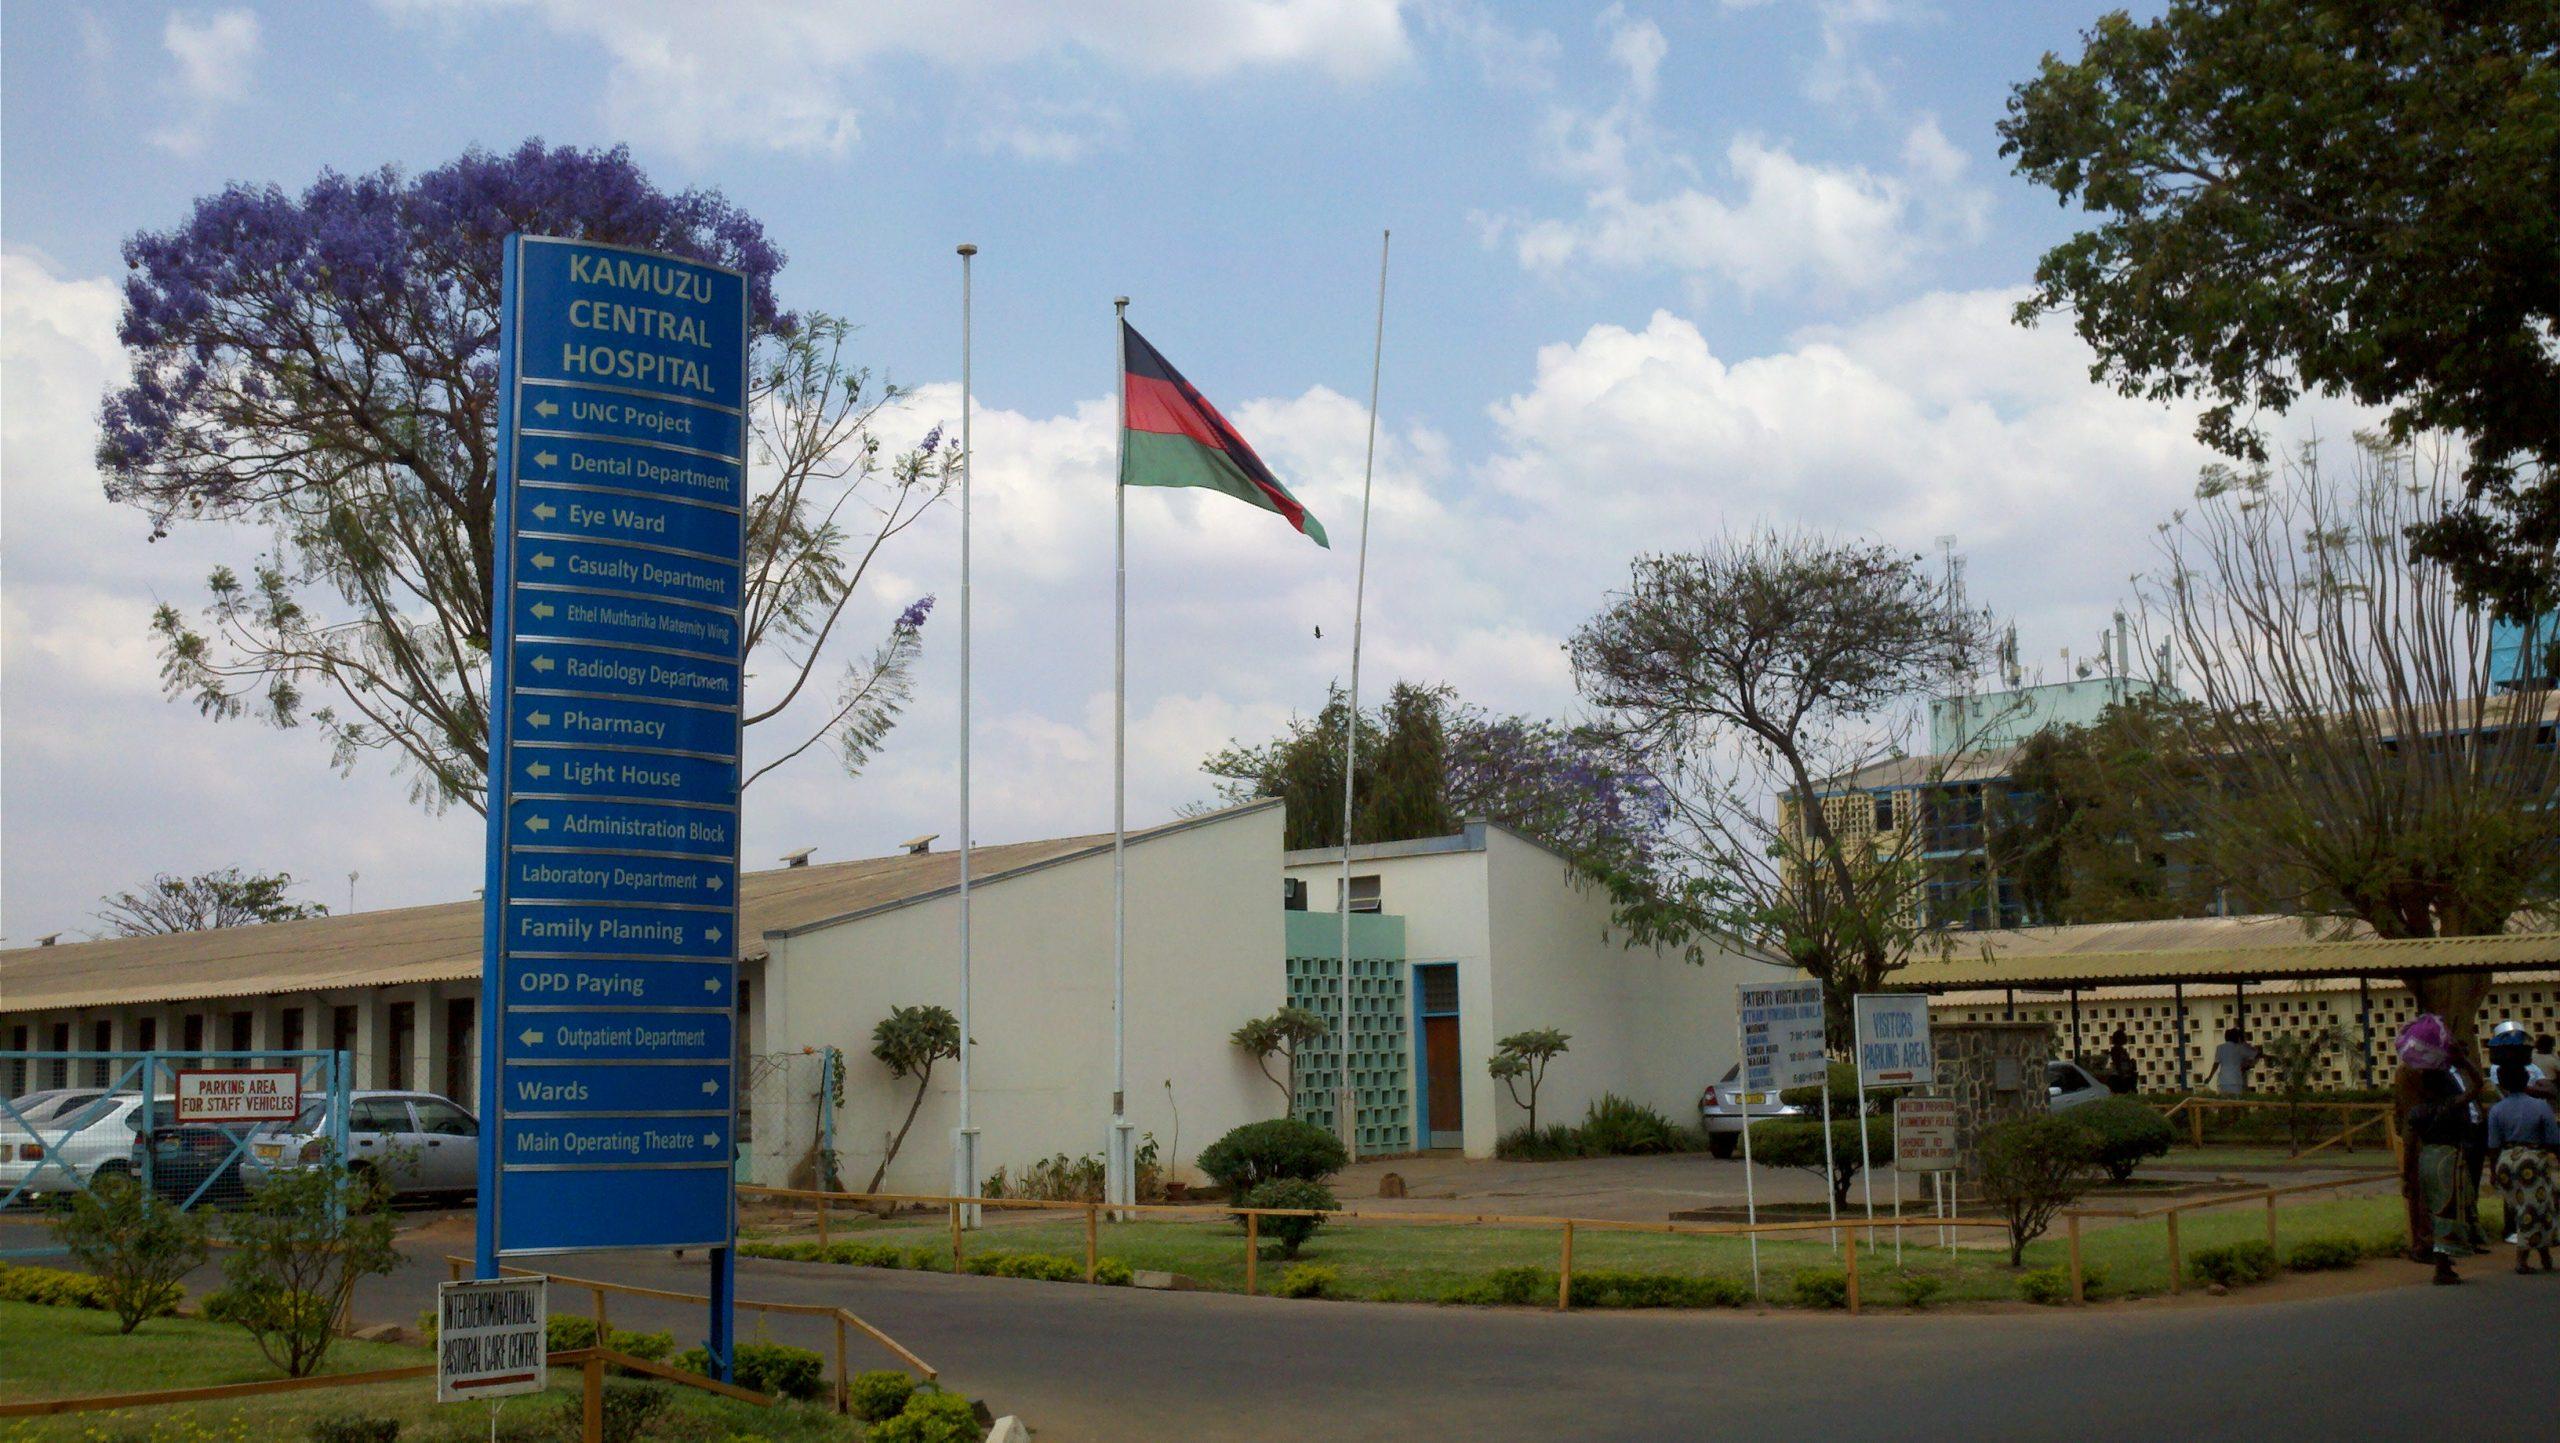 Kamzu Central hospital UNC Project-Malawi Site